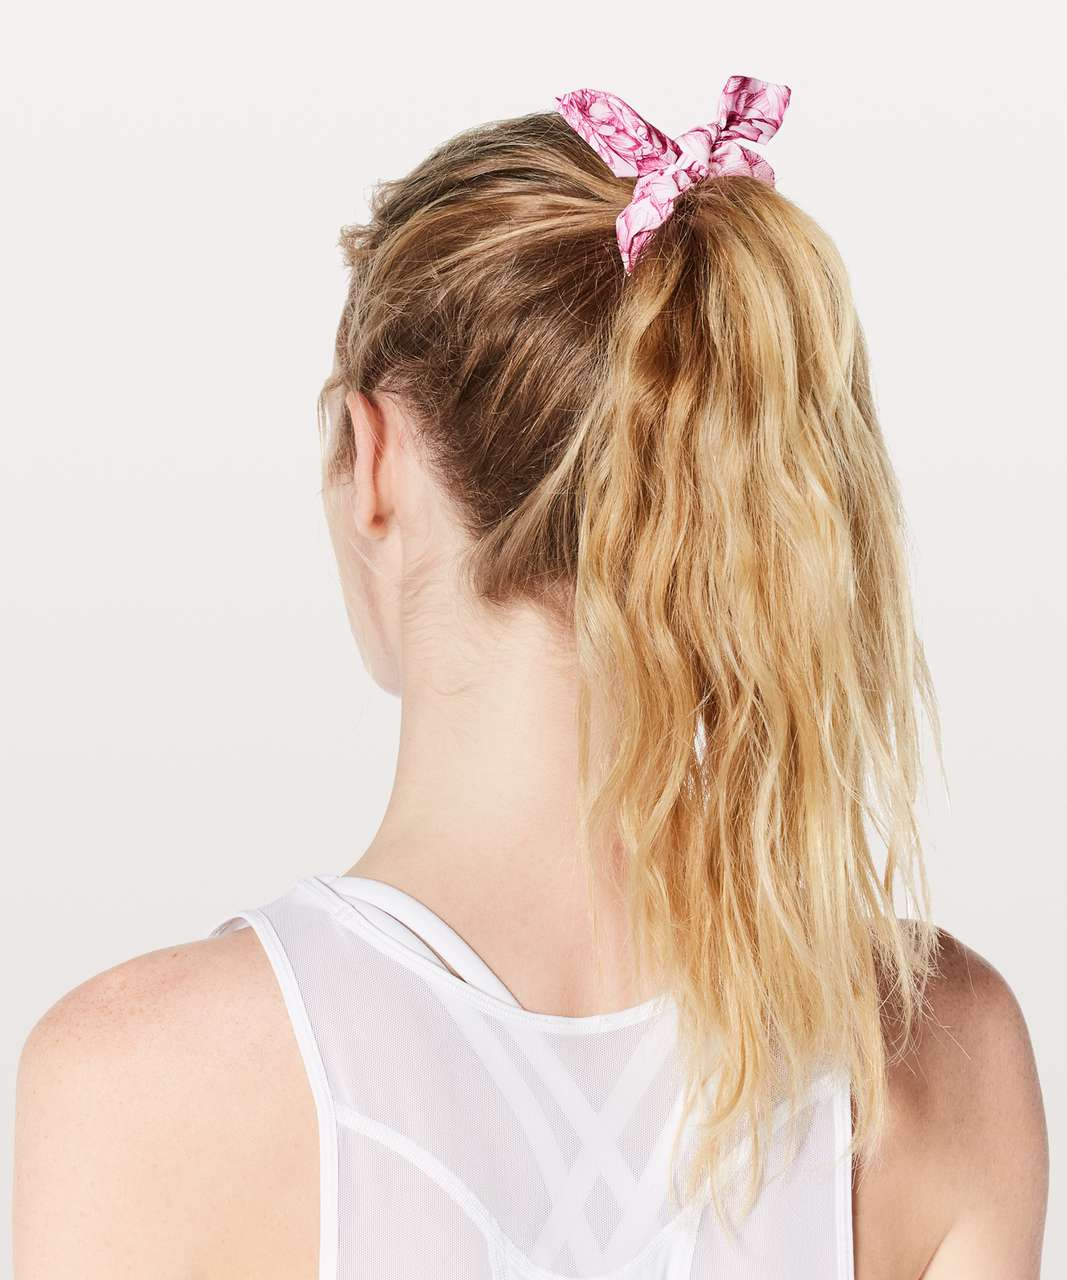 Lululemon Uplifting Scrunchie *Bow - Floral Bloom White Star Ruby